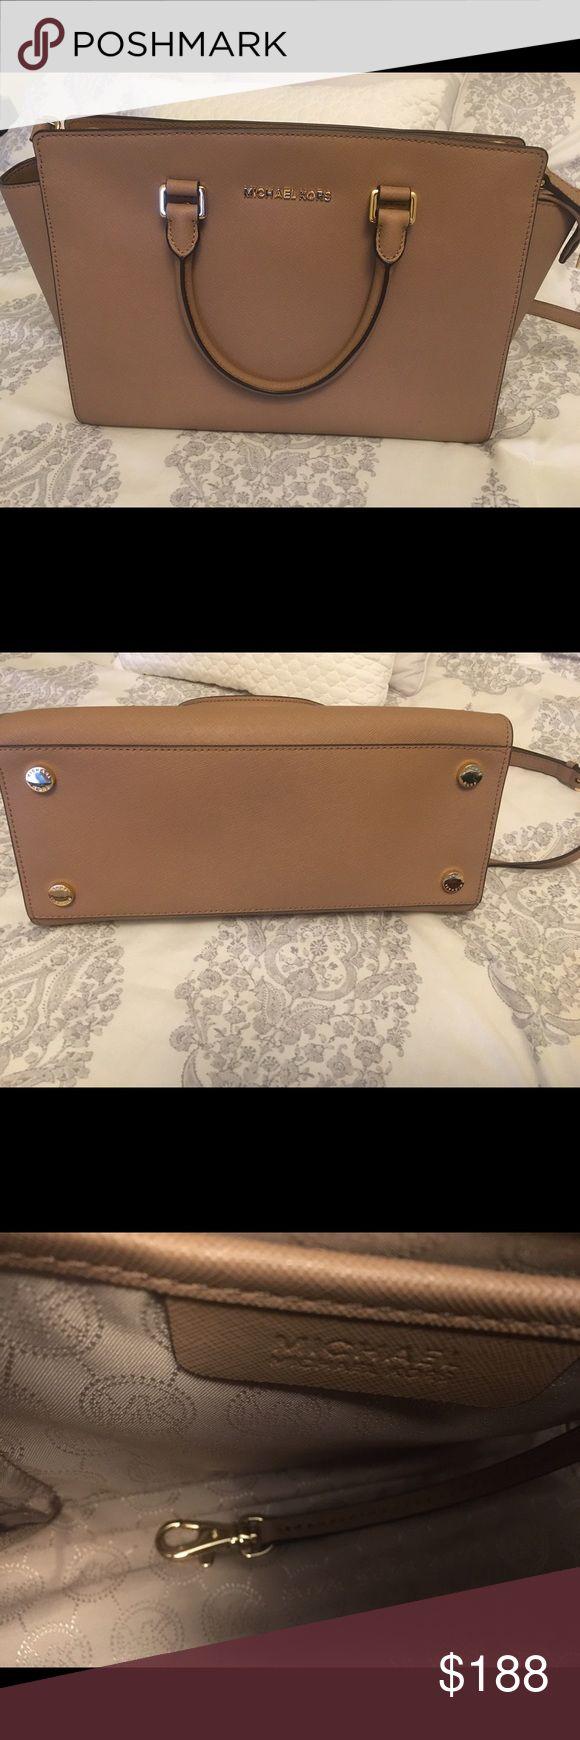 Michael Kors beige Selma Medium satchel Michael Kors Selma satchel bag in a beige color. This bag has only been used about 5 times. Michael Kors Bags Crossbody Bags